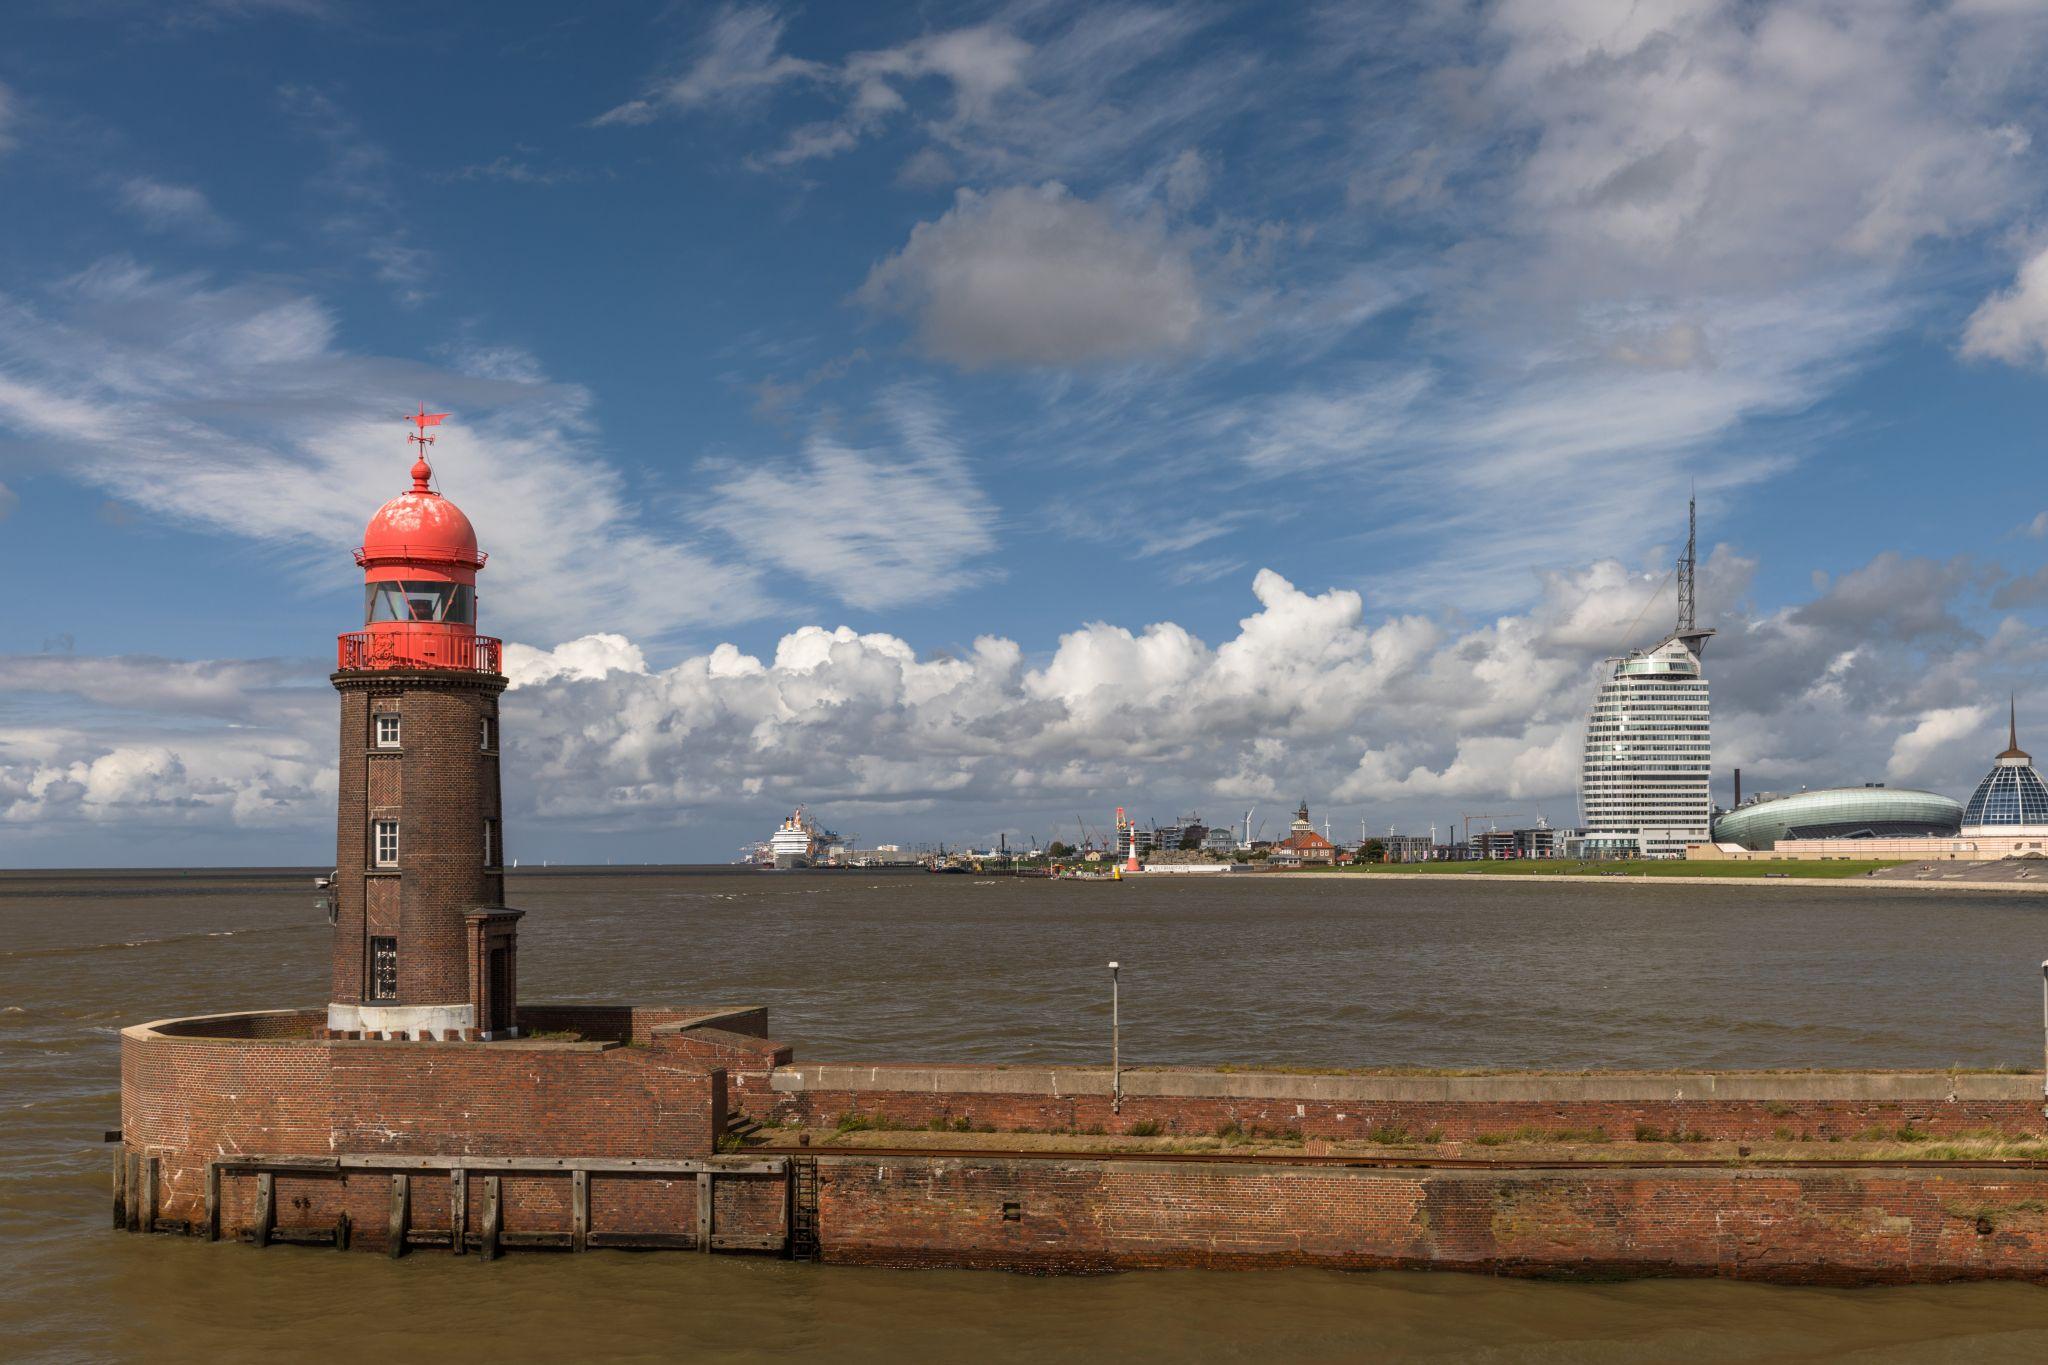 Molenturm Bremerhaven, Germany